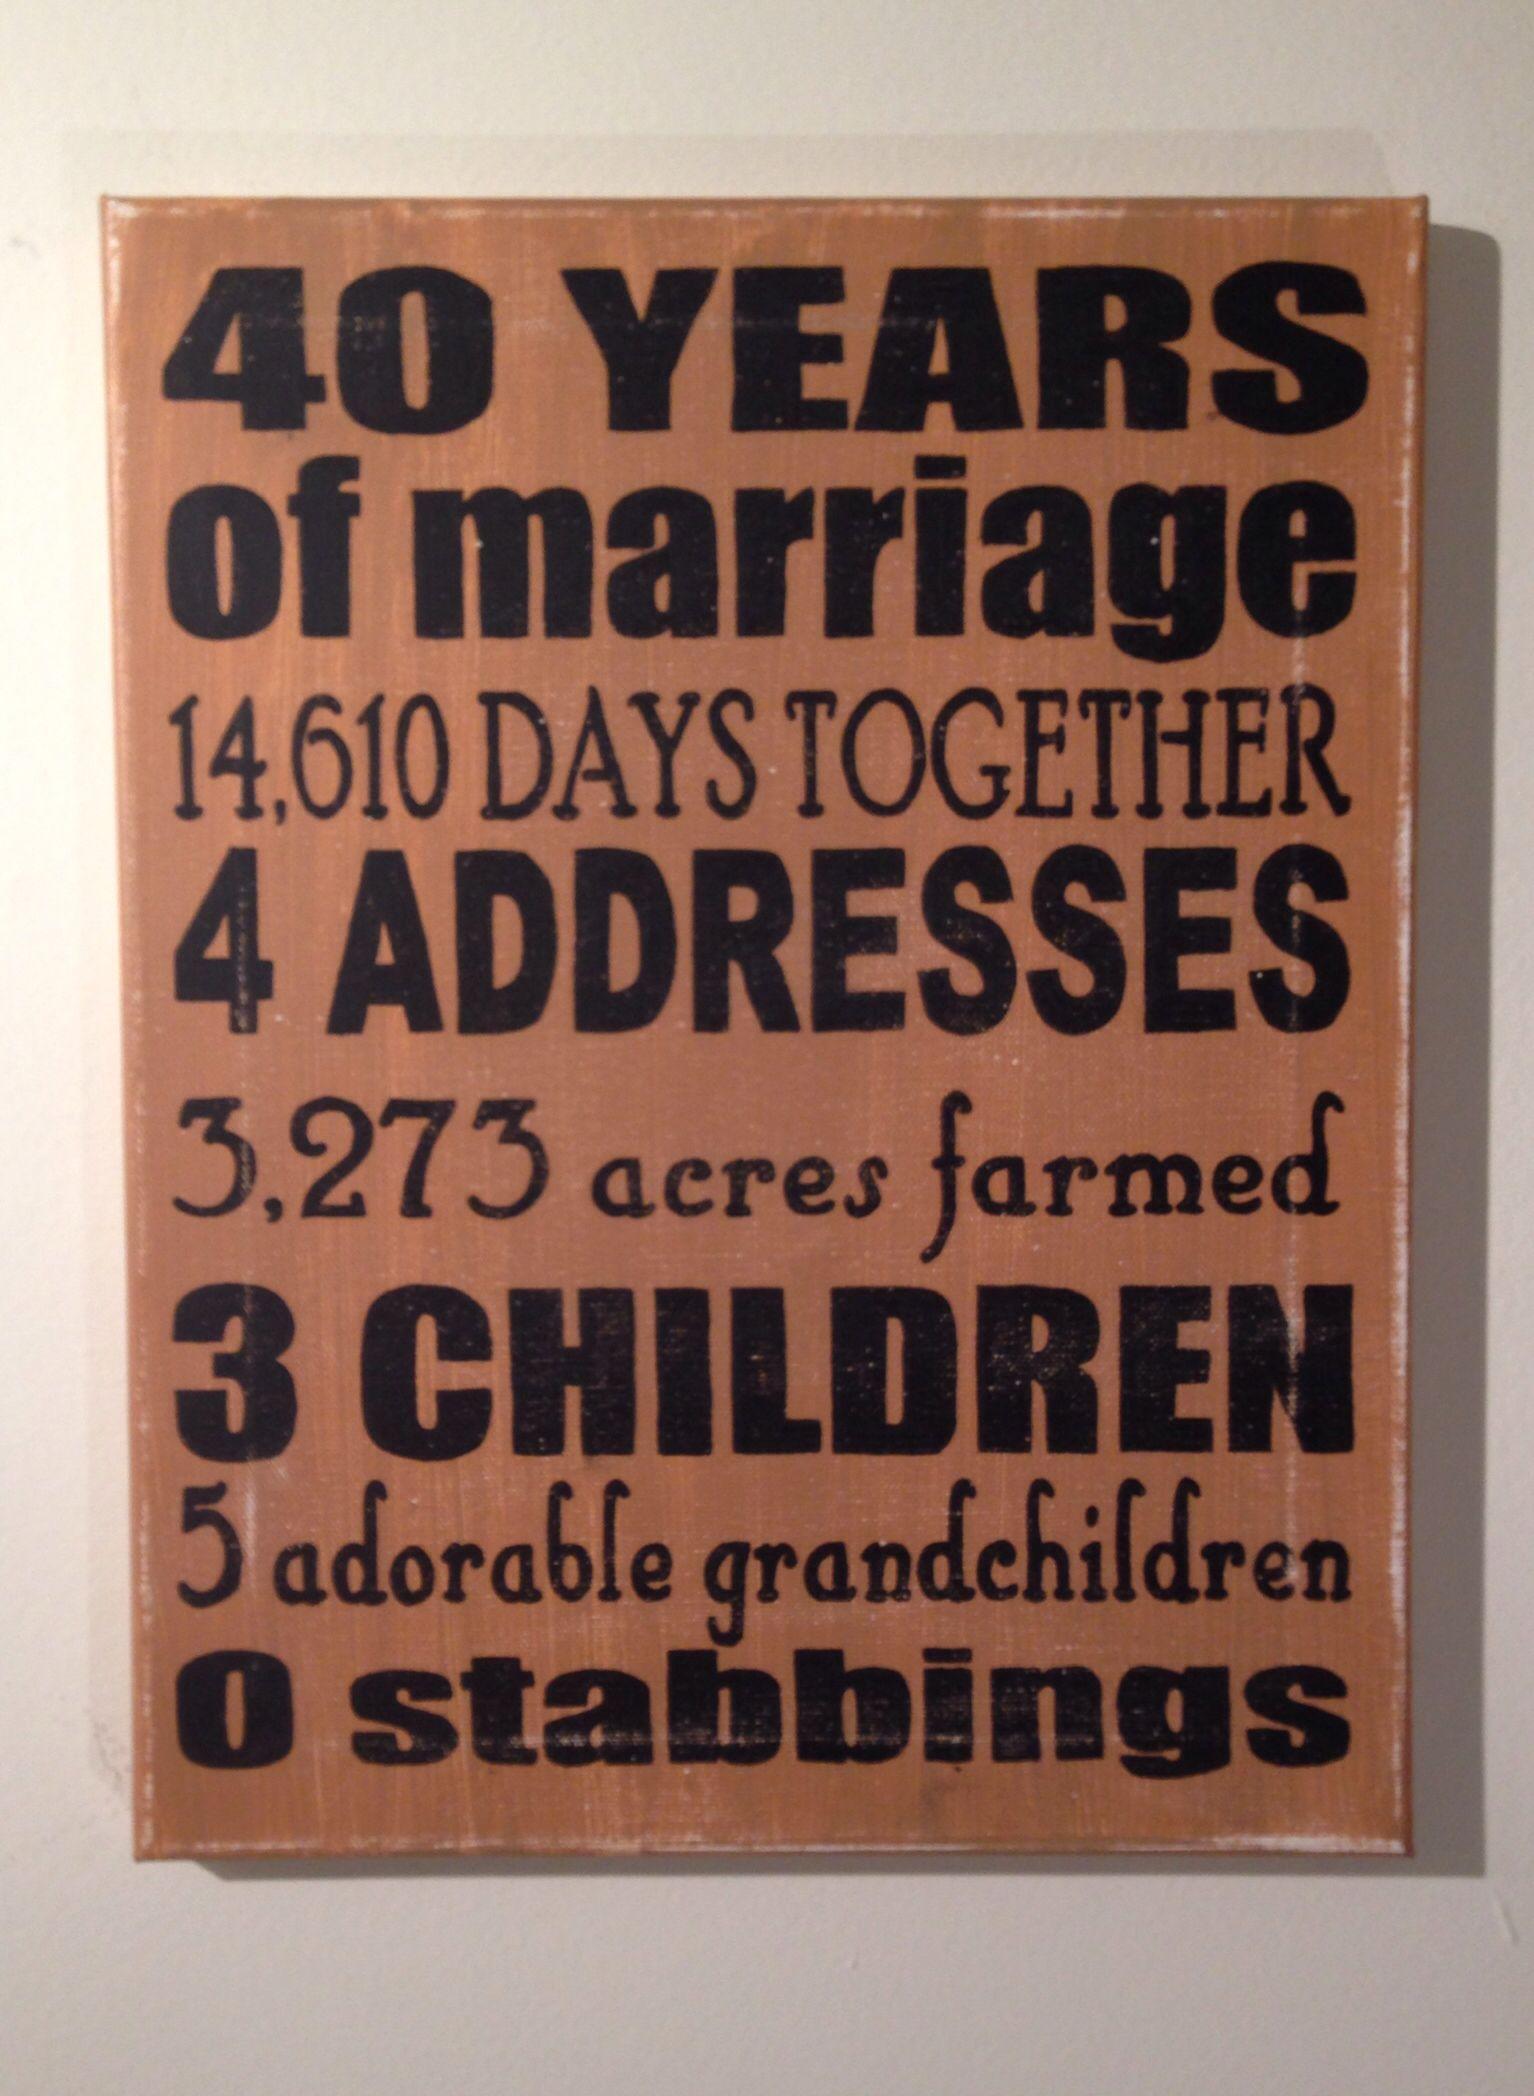 Decoration ideas for 40th wedding anniversary  For my parents th Wedding Anniversary  Anniversary  Pinterest